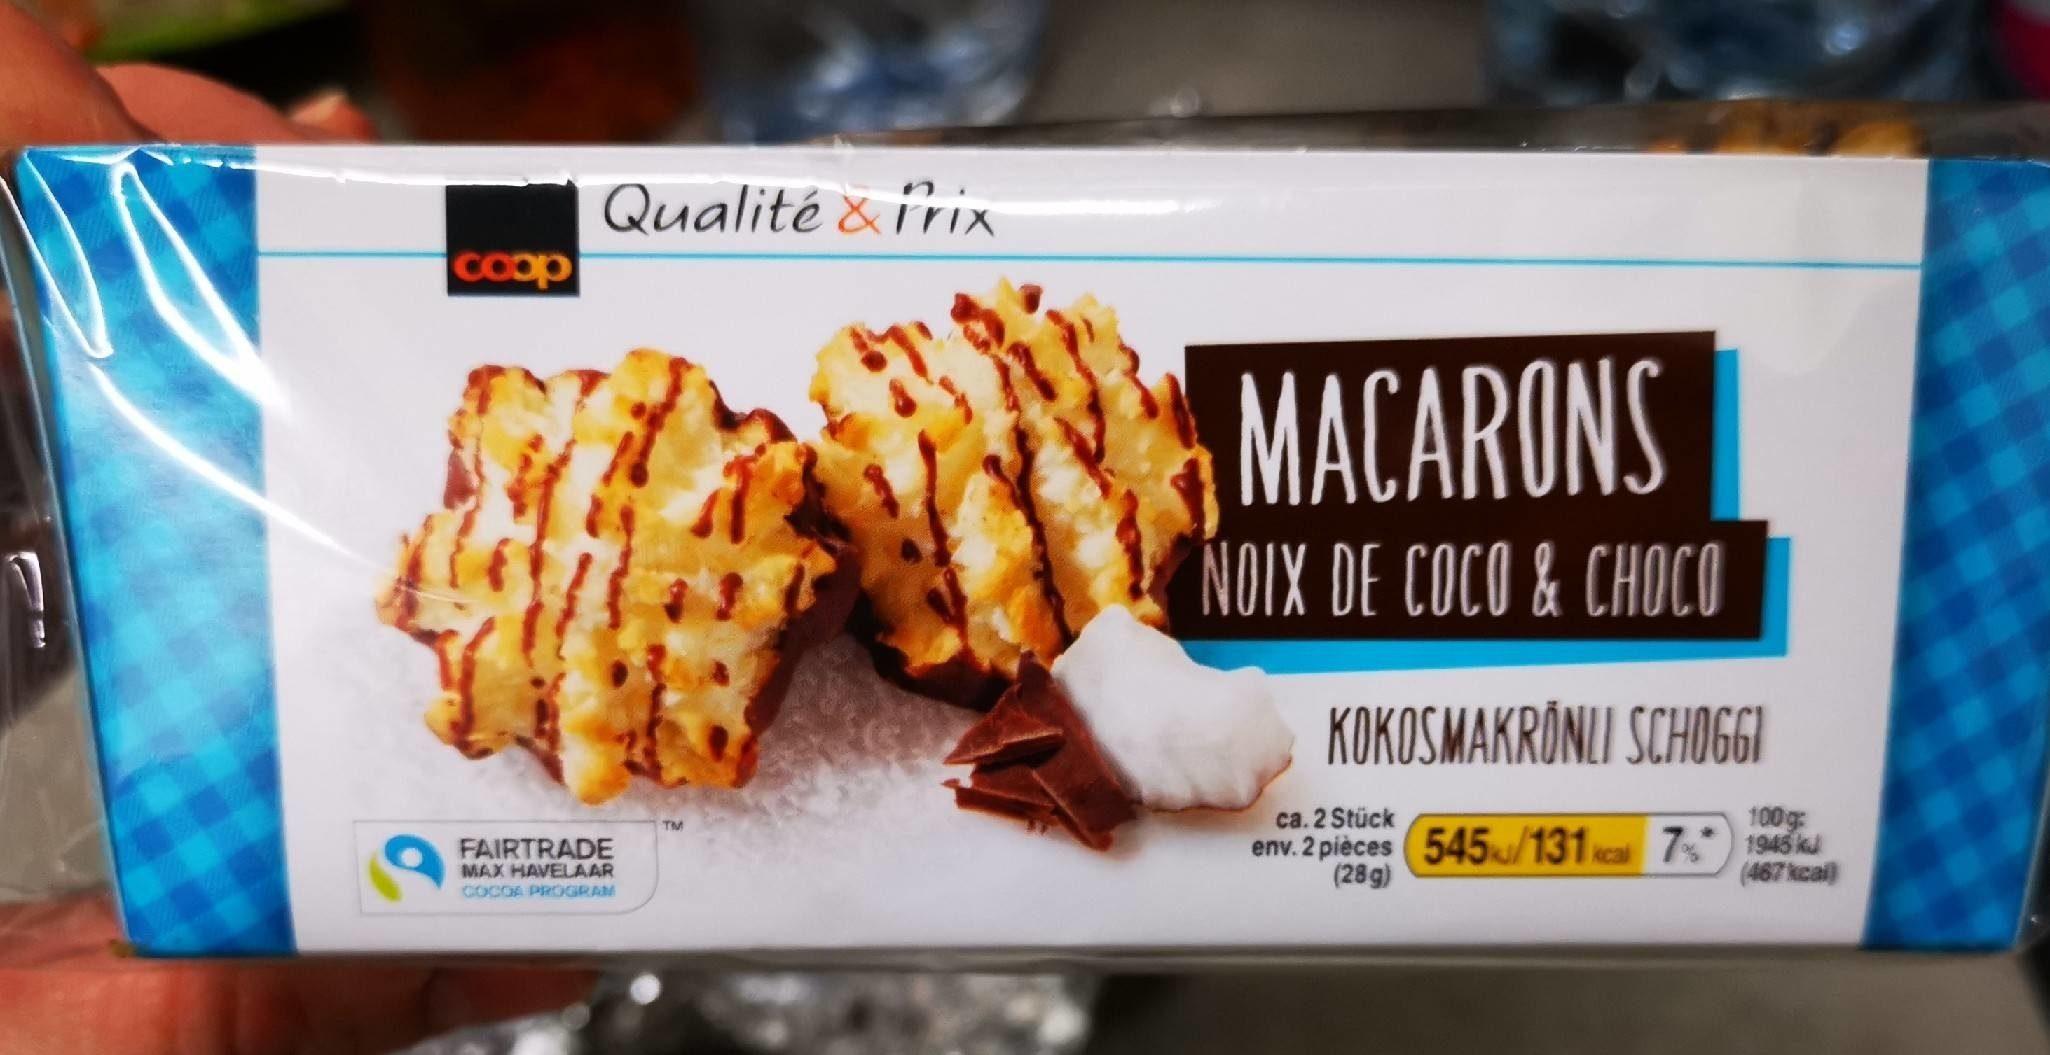 Macarons noix de coco choco - Produit